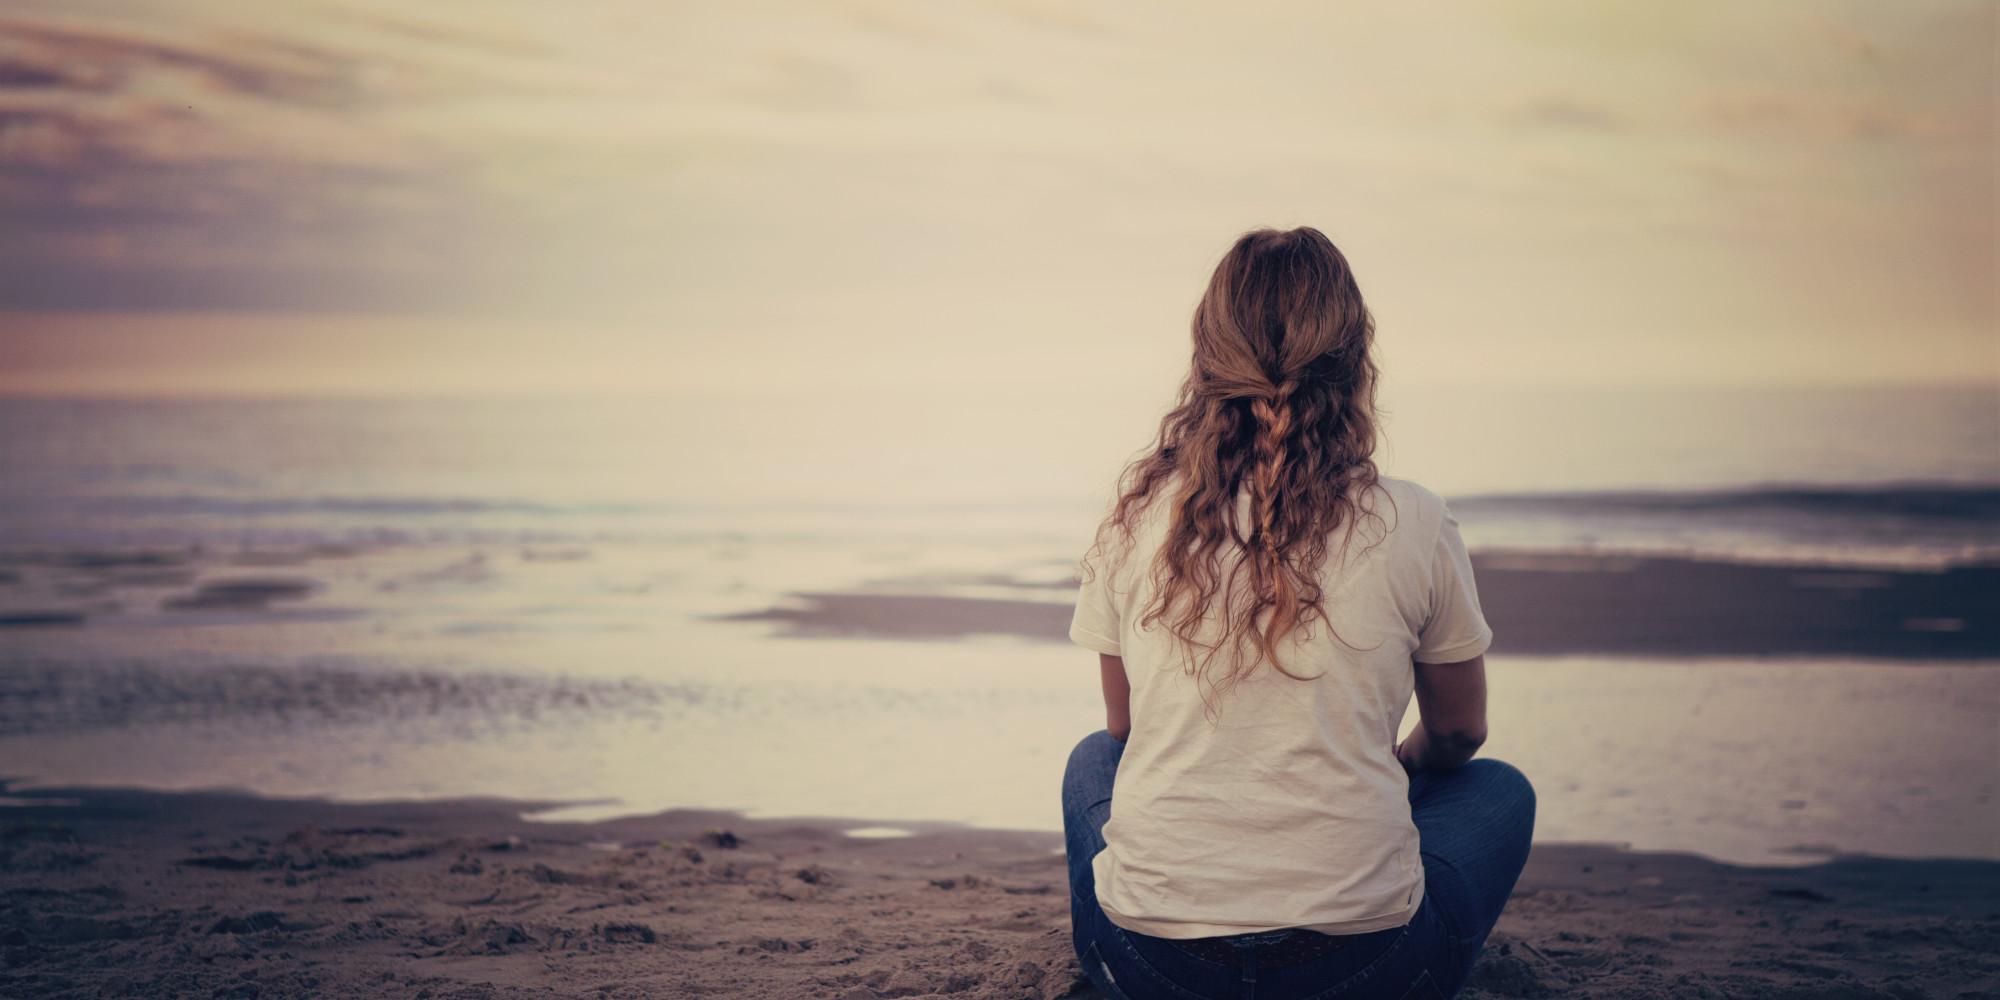 Dimagrire velocemente con la mindfulness